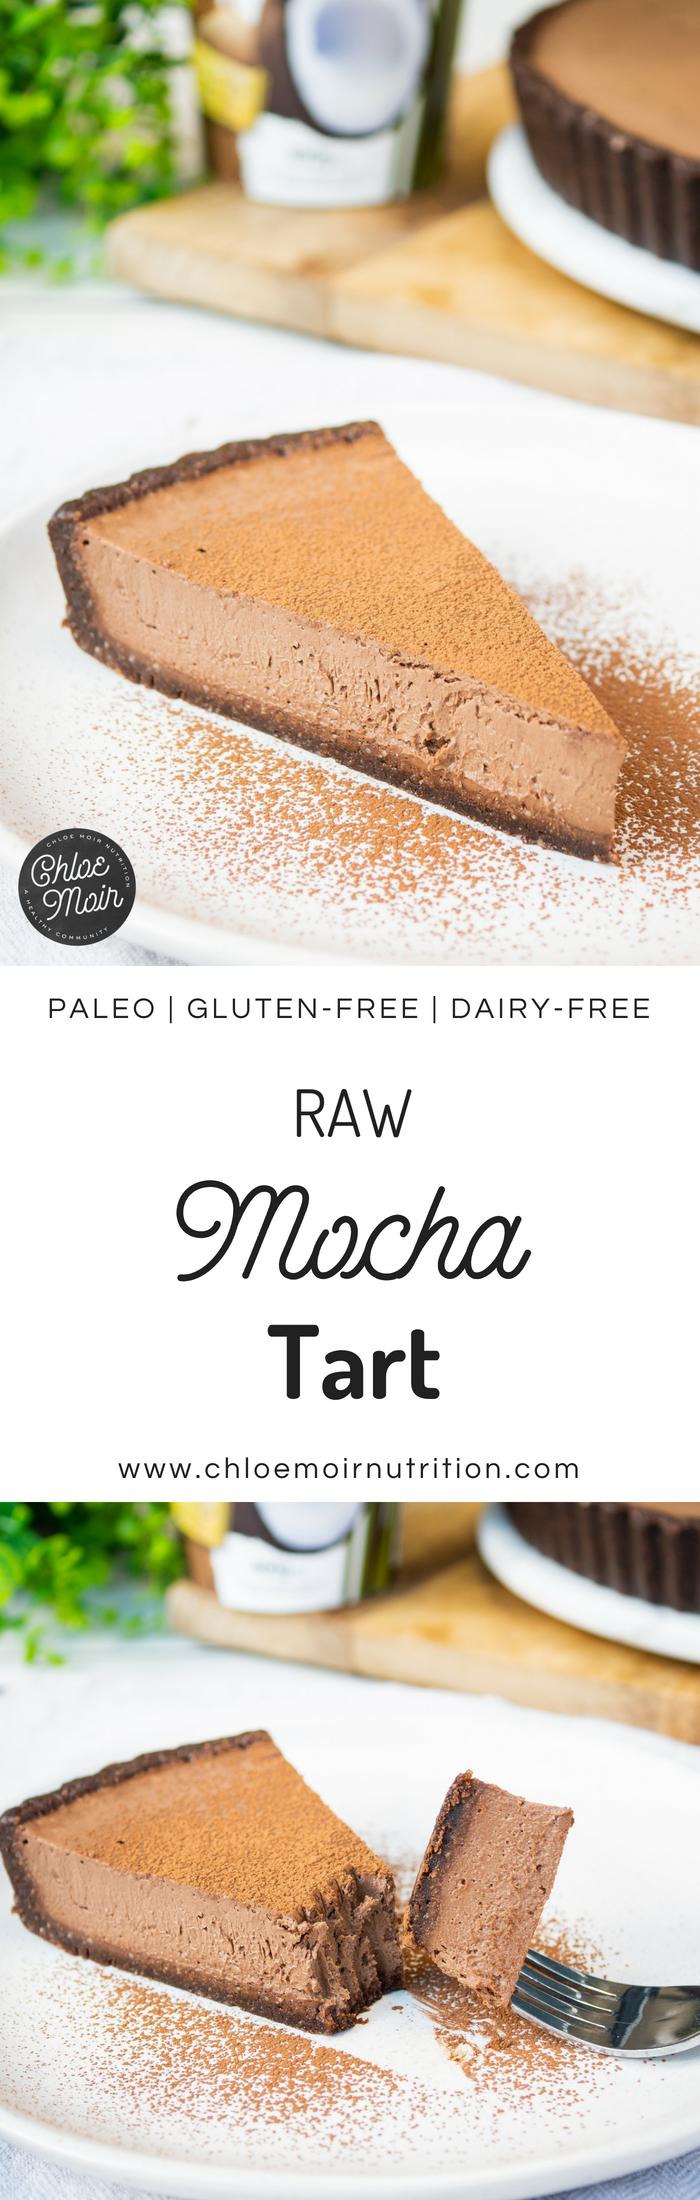 raw mocha tart pinterest.png